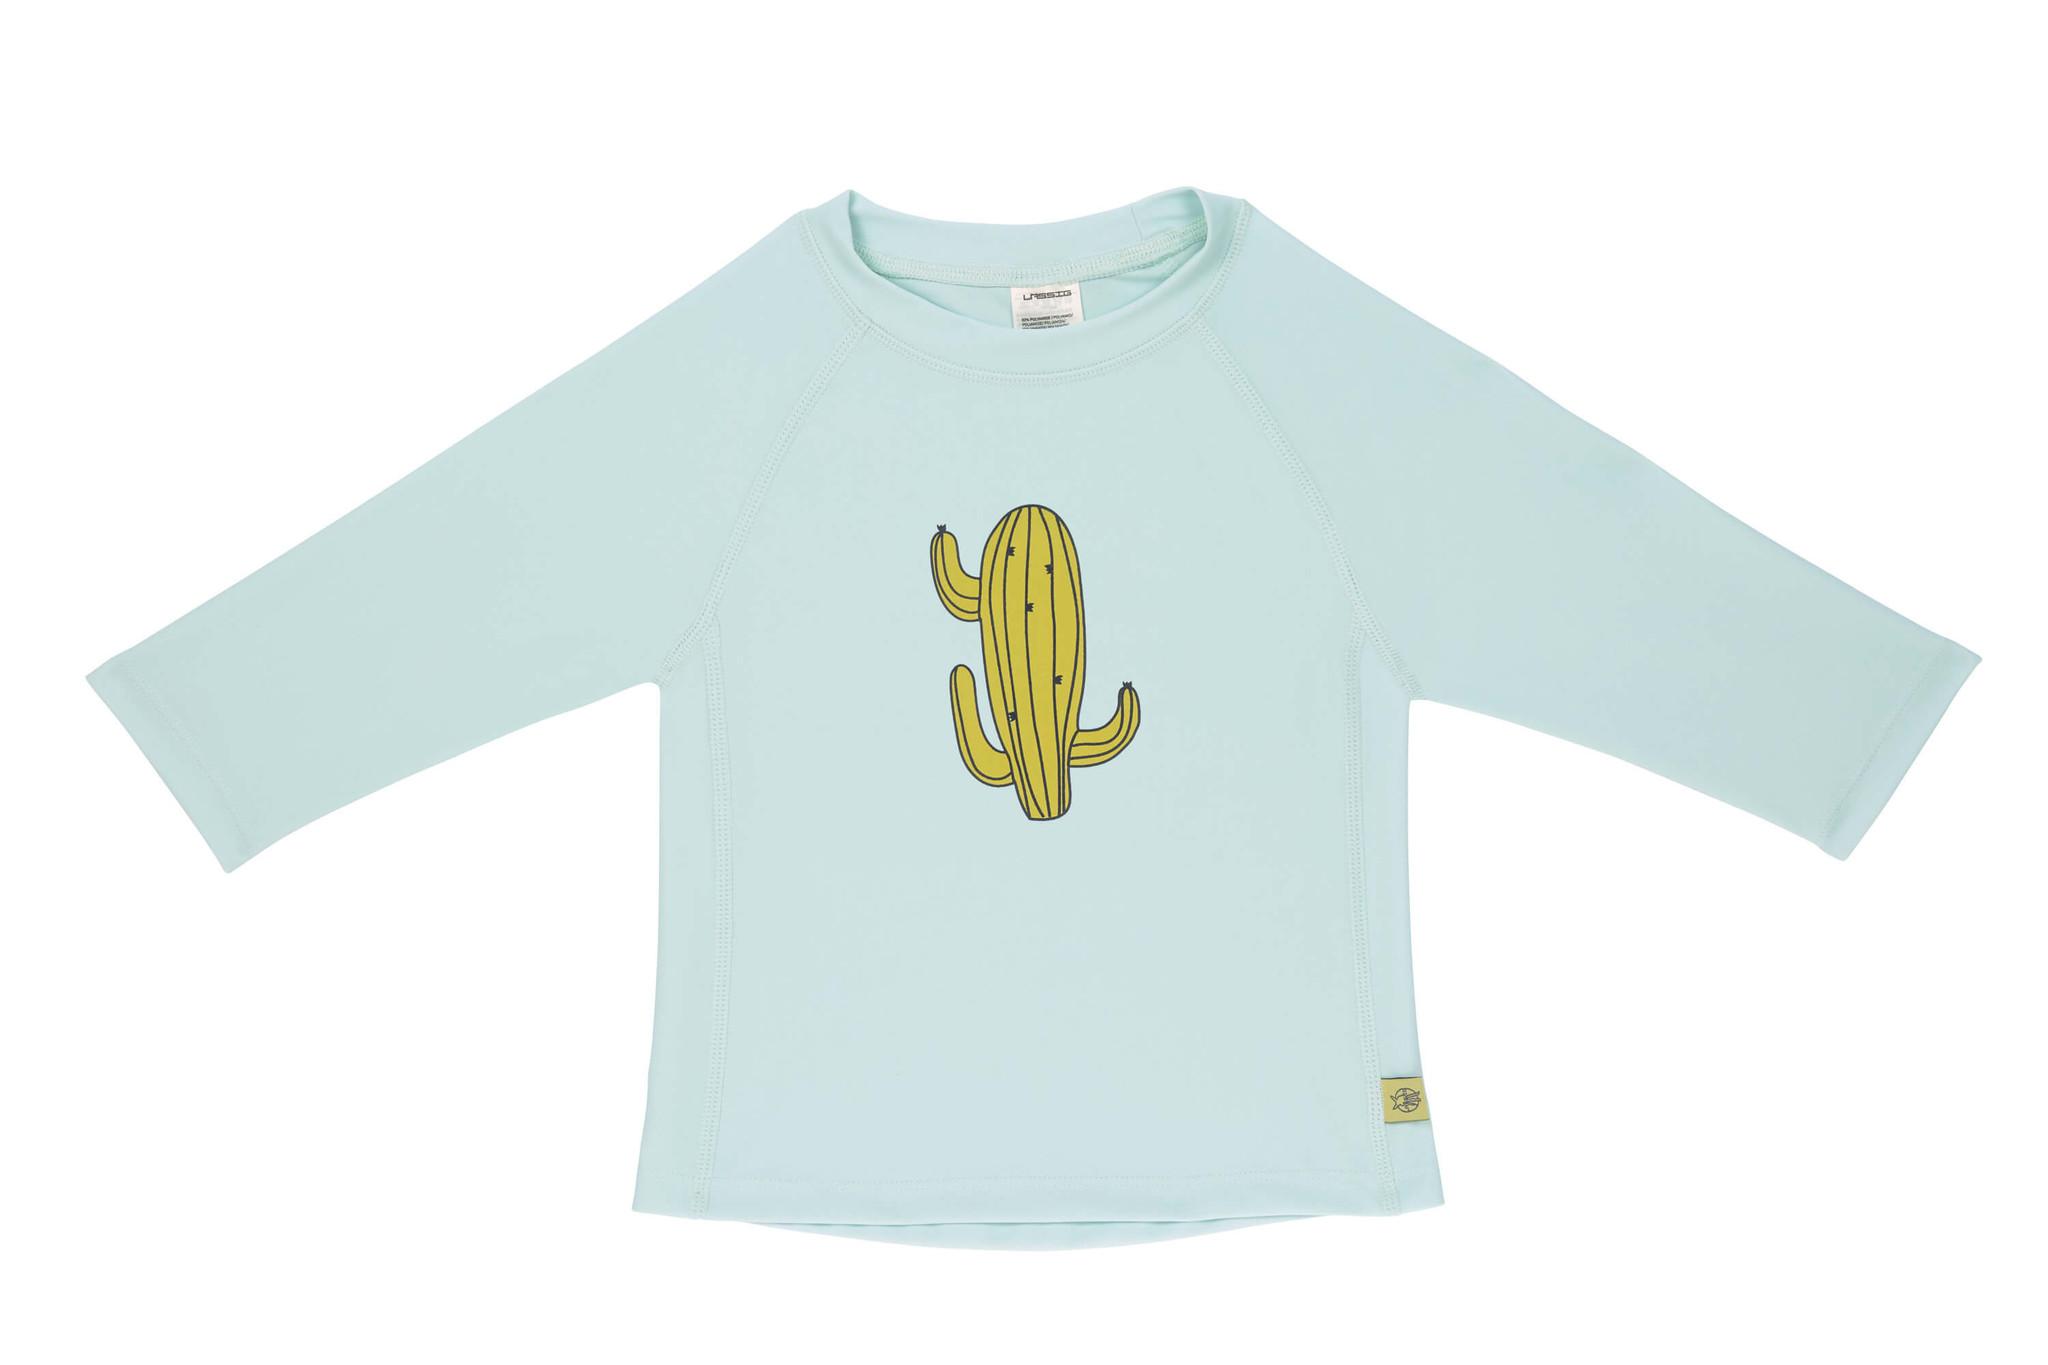 Lässig Lässig Splash & Fun Lange mouw Rashguard / zwemshirt - Cactus Family 6 maanden